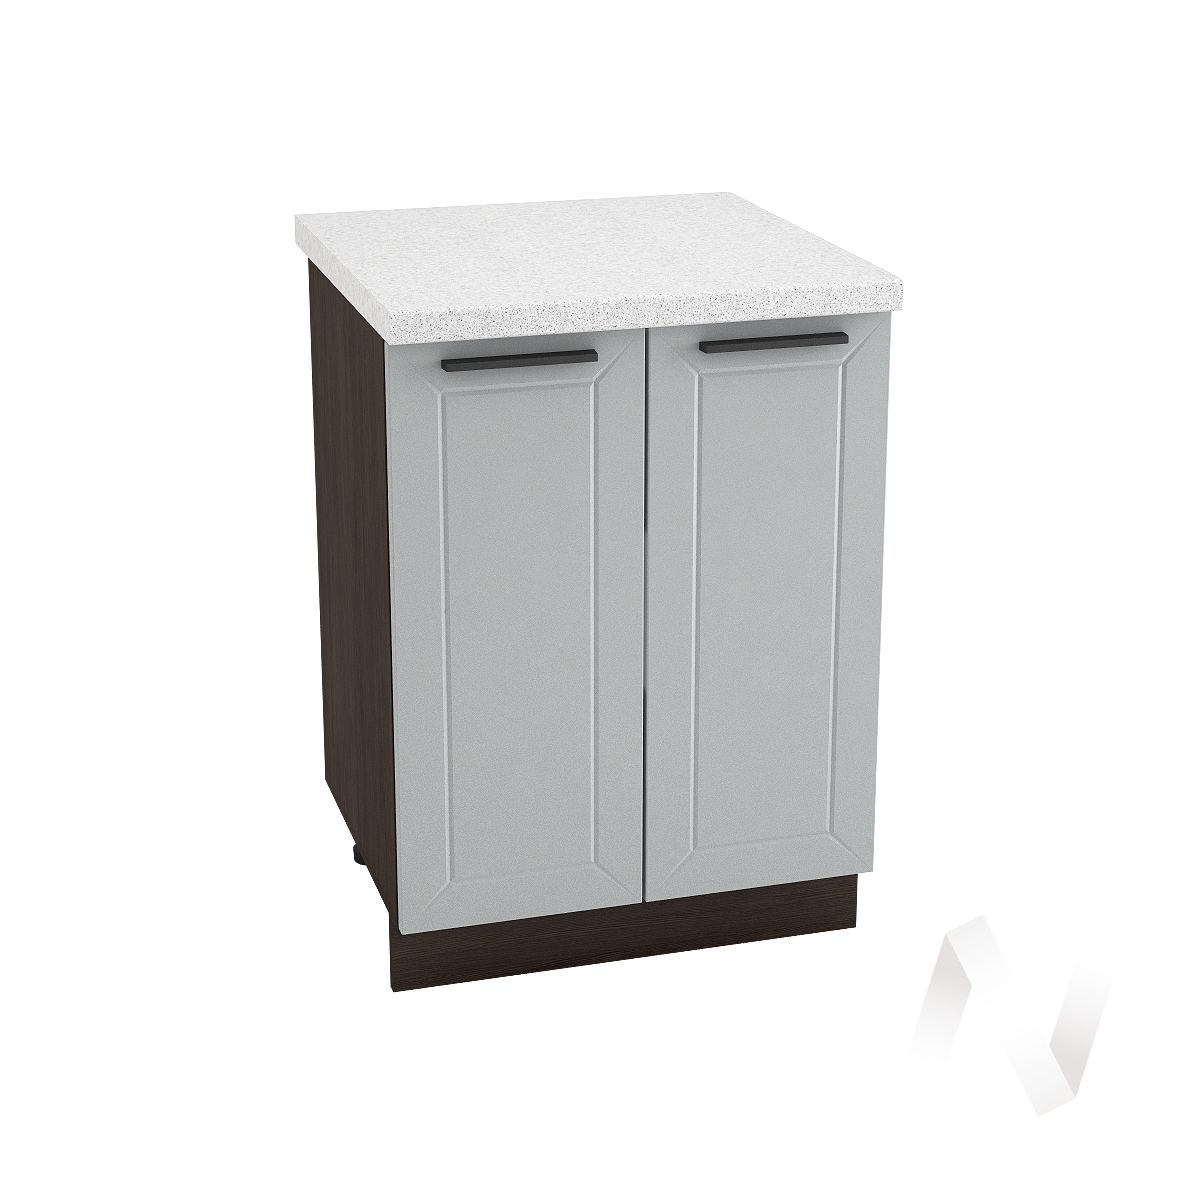 "Кухня ""Глетчер"": Шкаф нижний 600, ШН 600 (Гейнсборо Силк/корпус венге)"